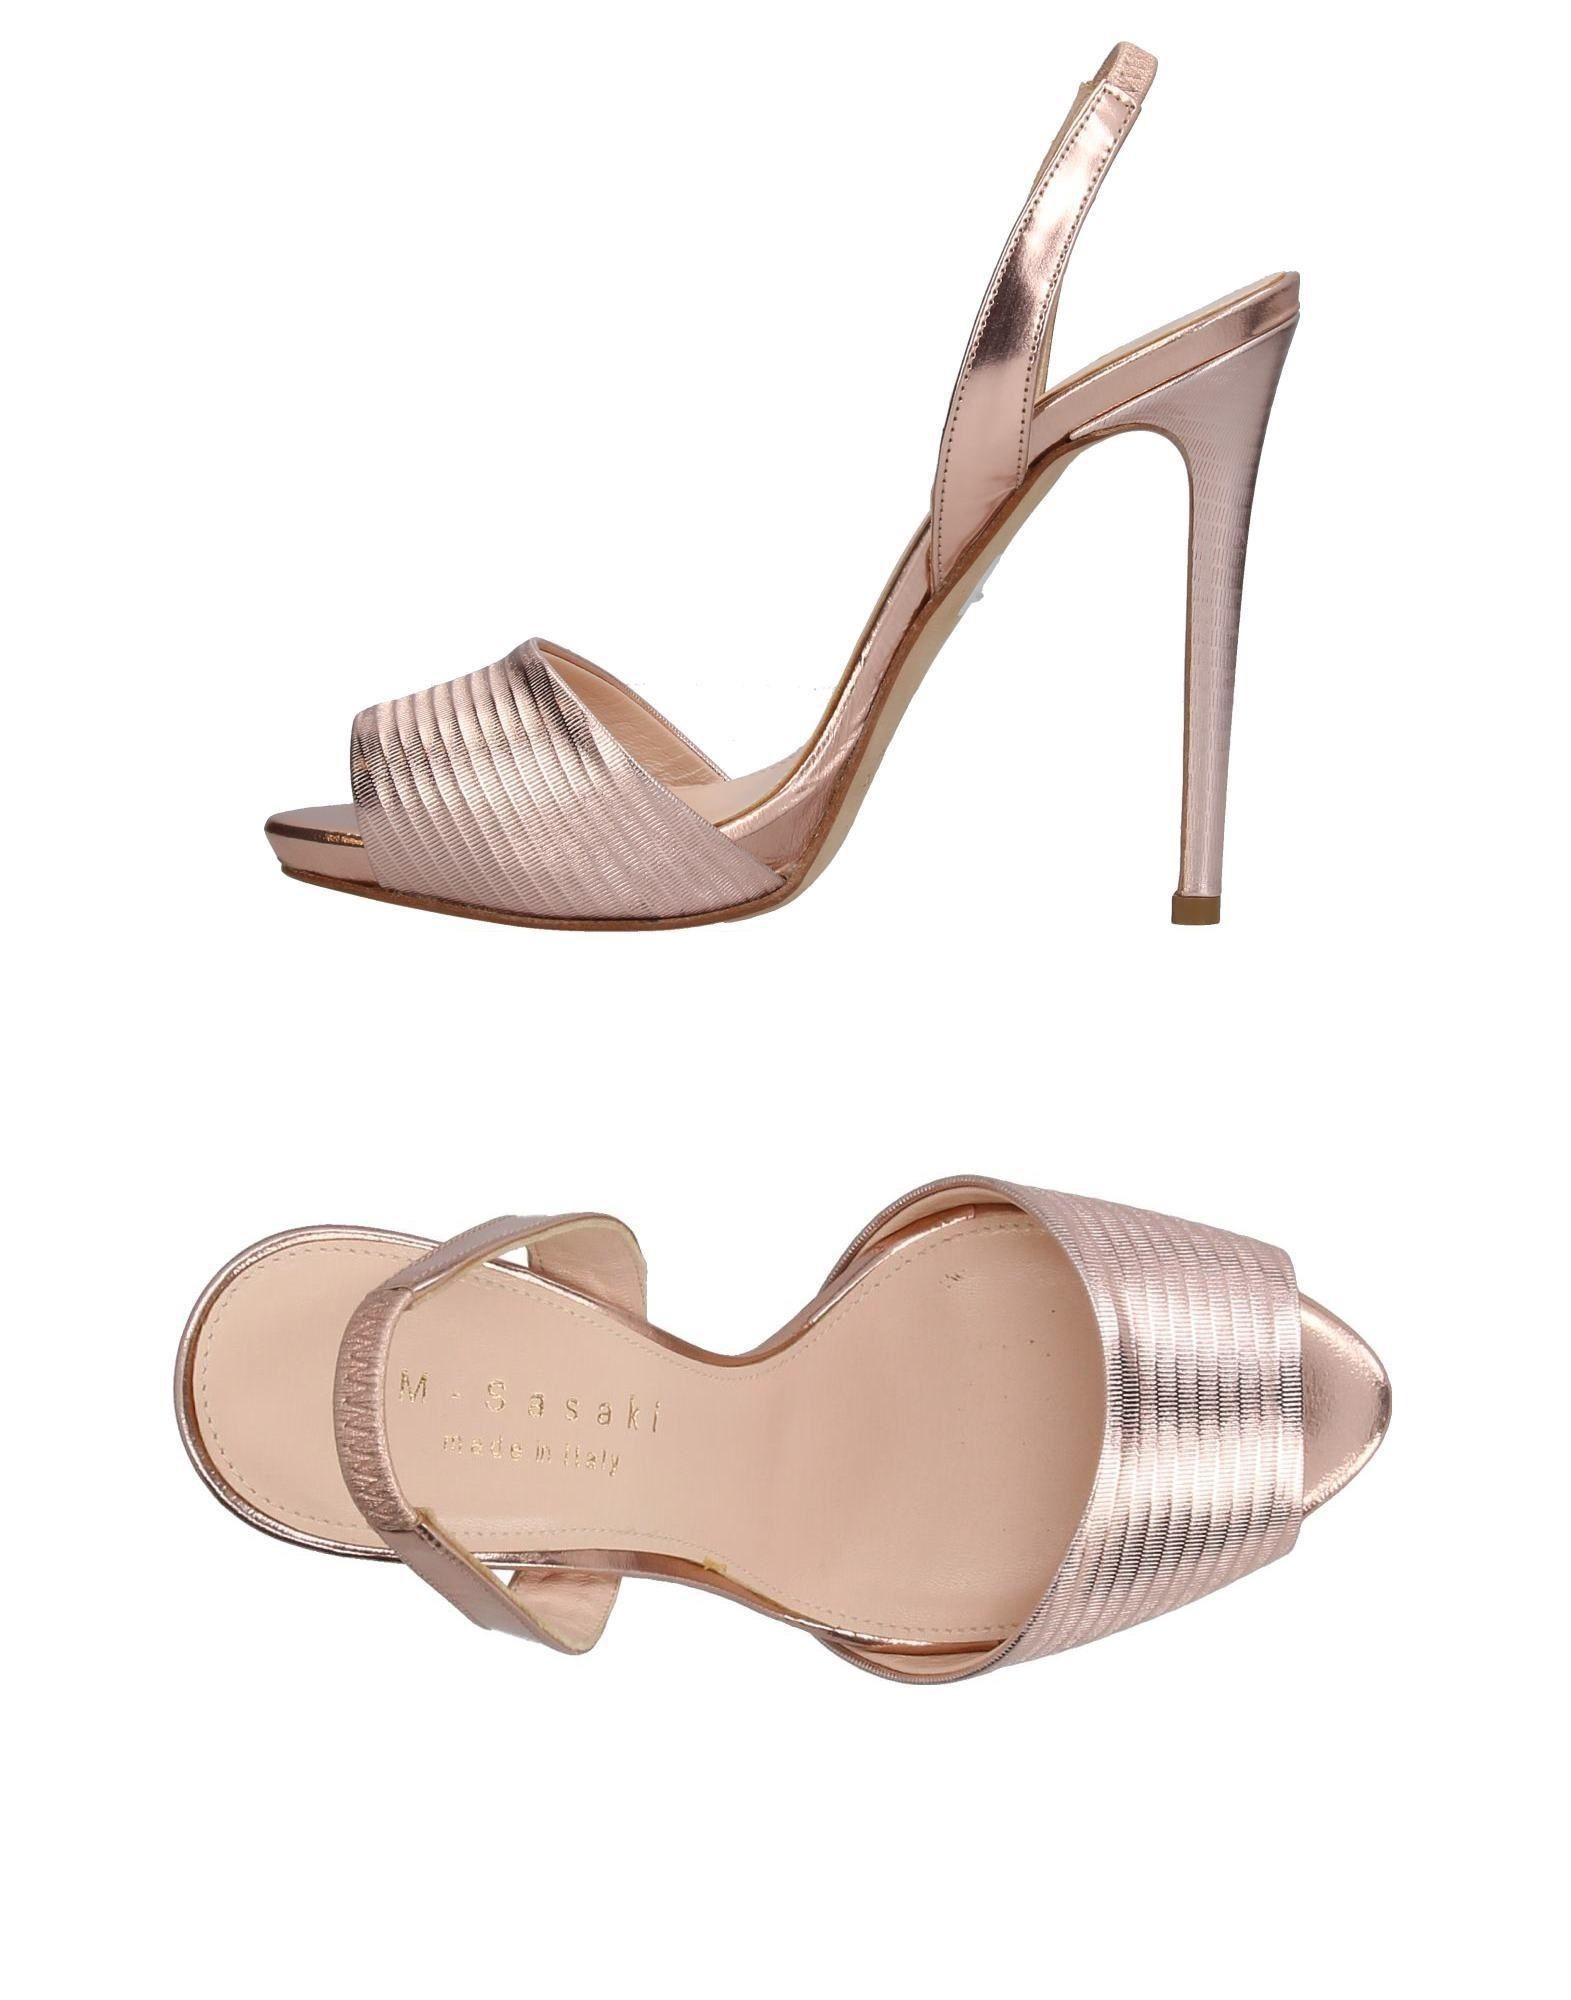 Sandales Meg Sasaki Femme - Sandales Meg Sasaki sur